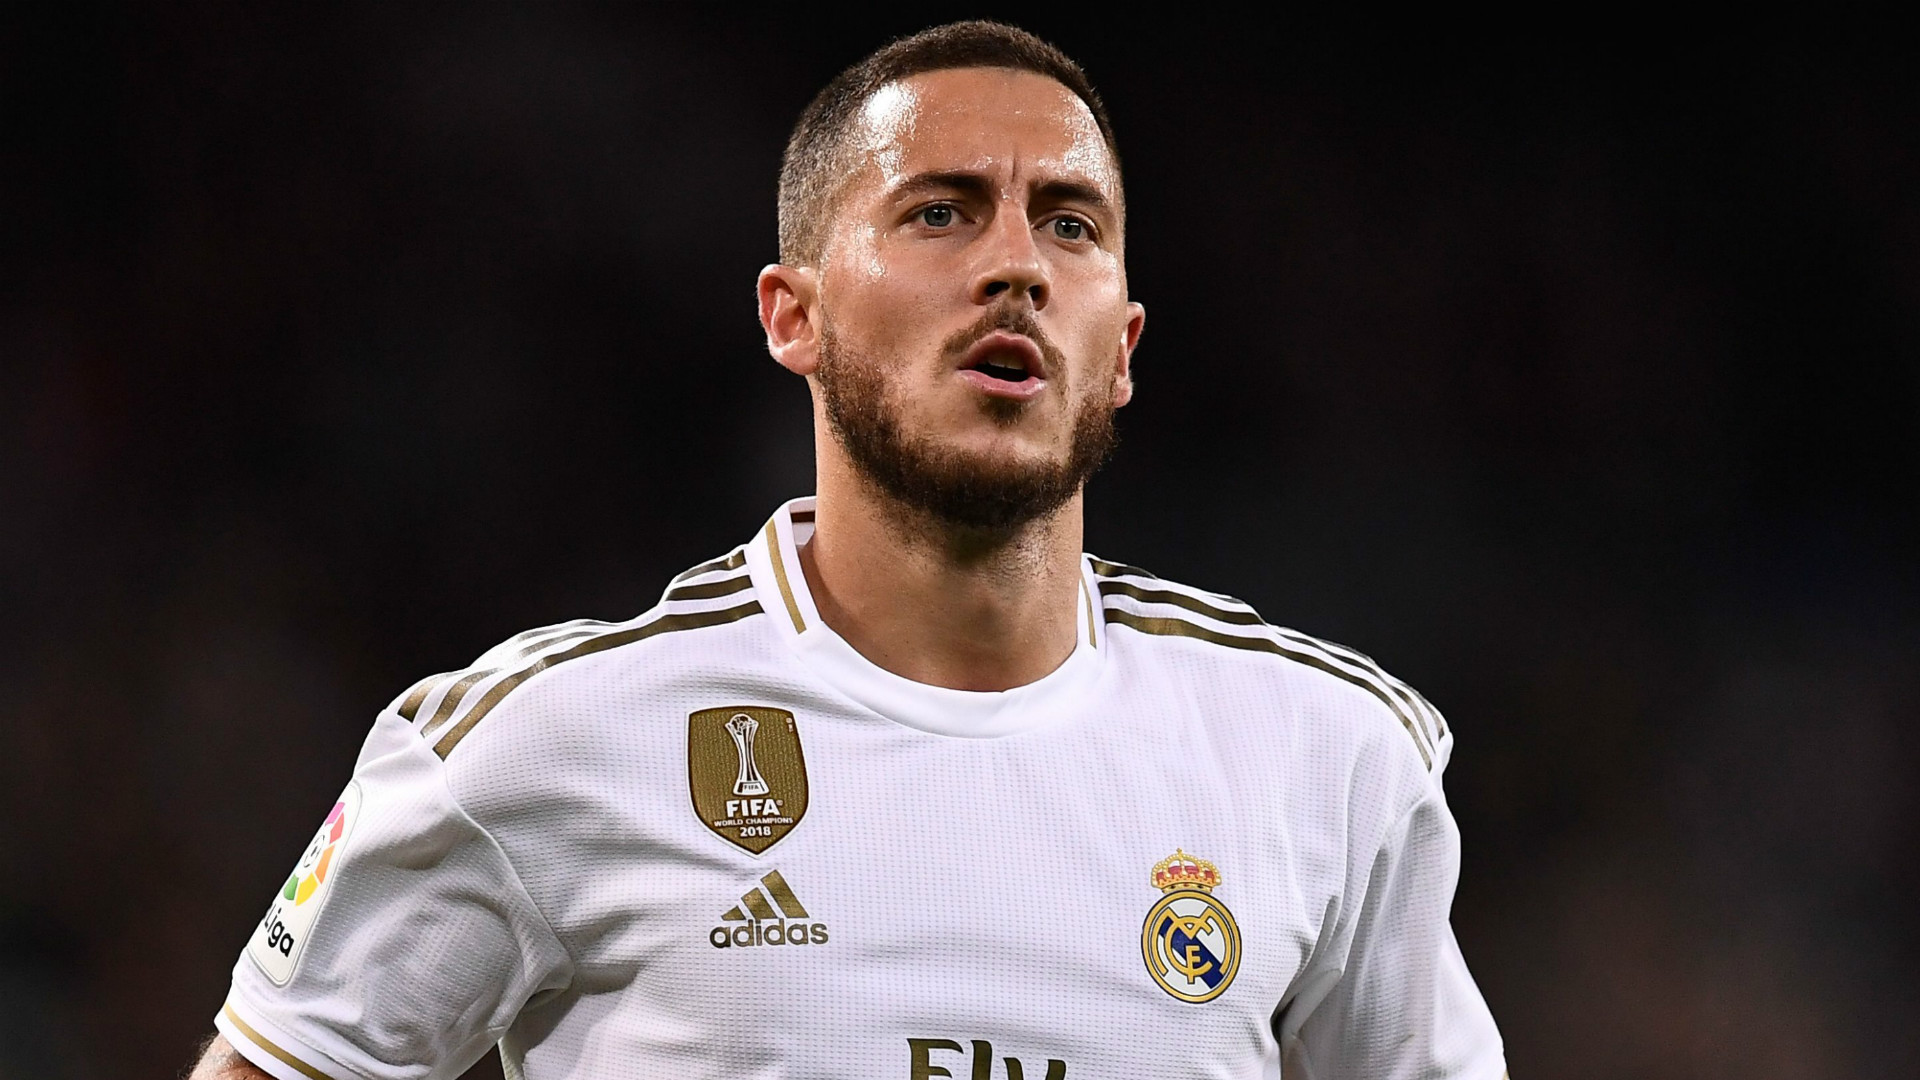 Hazard has been unlucky & will star for Real Madrid' - Belgium ...